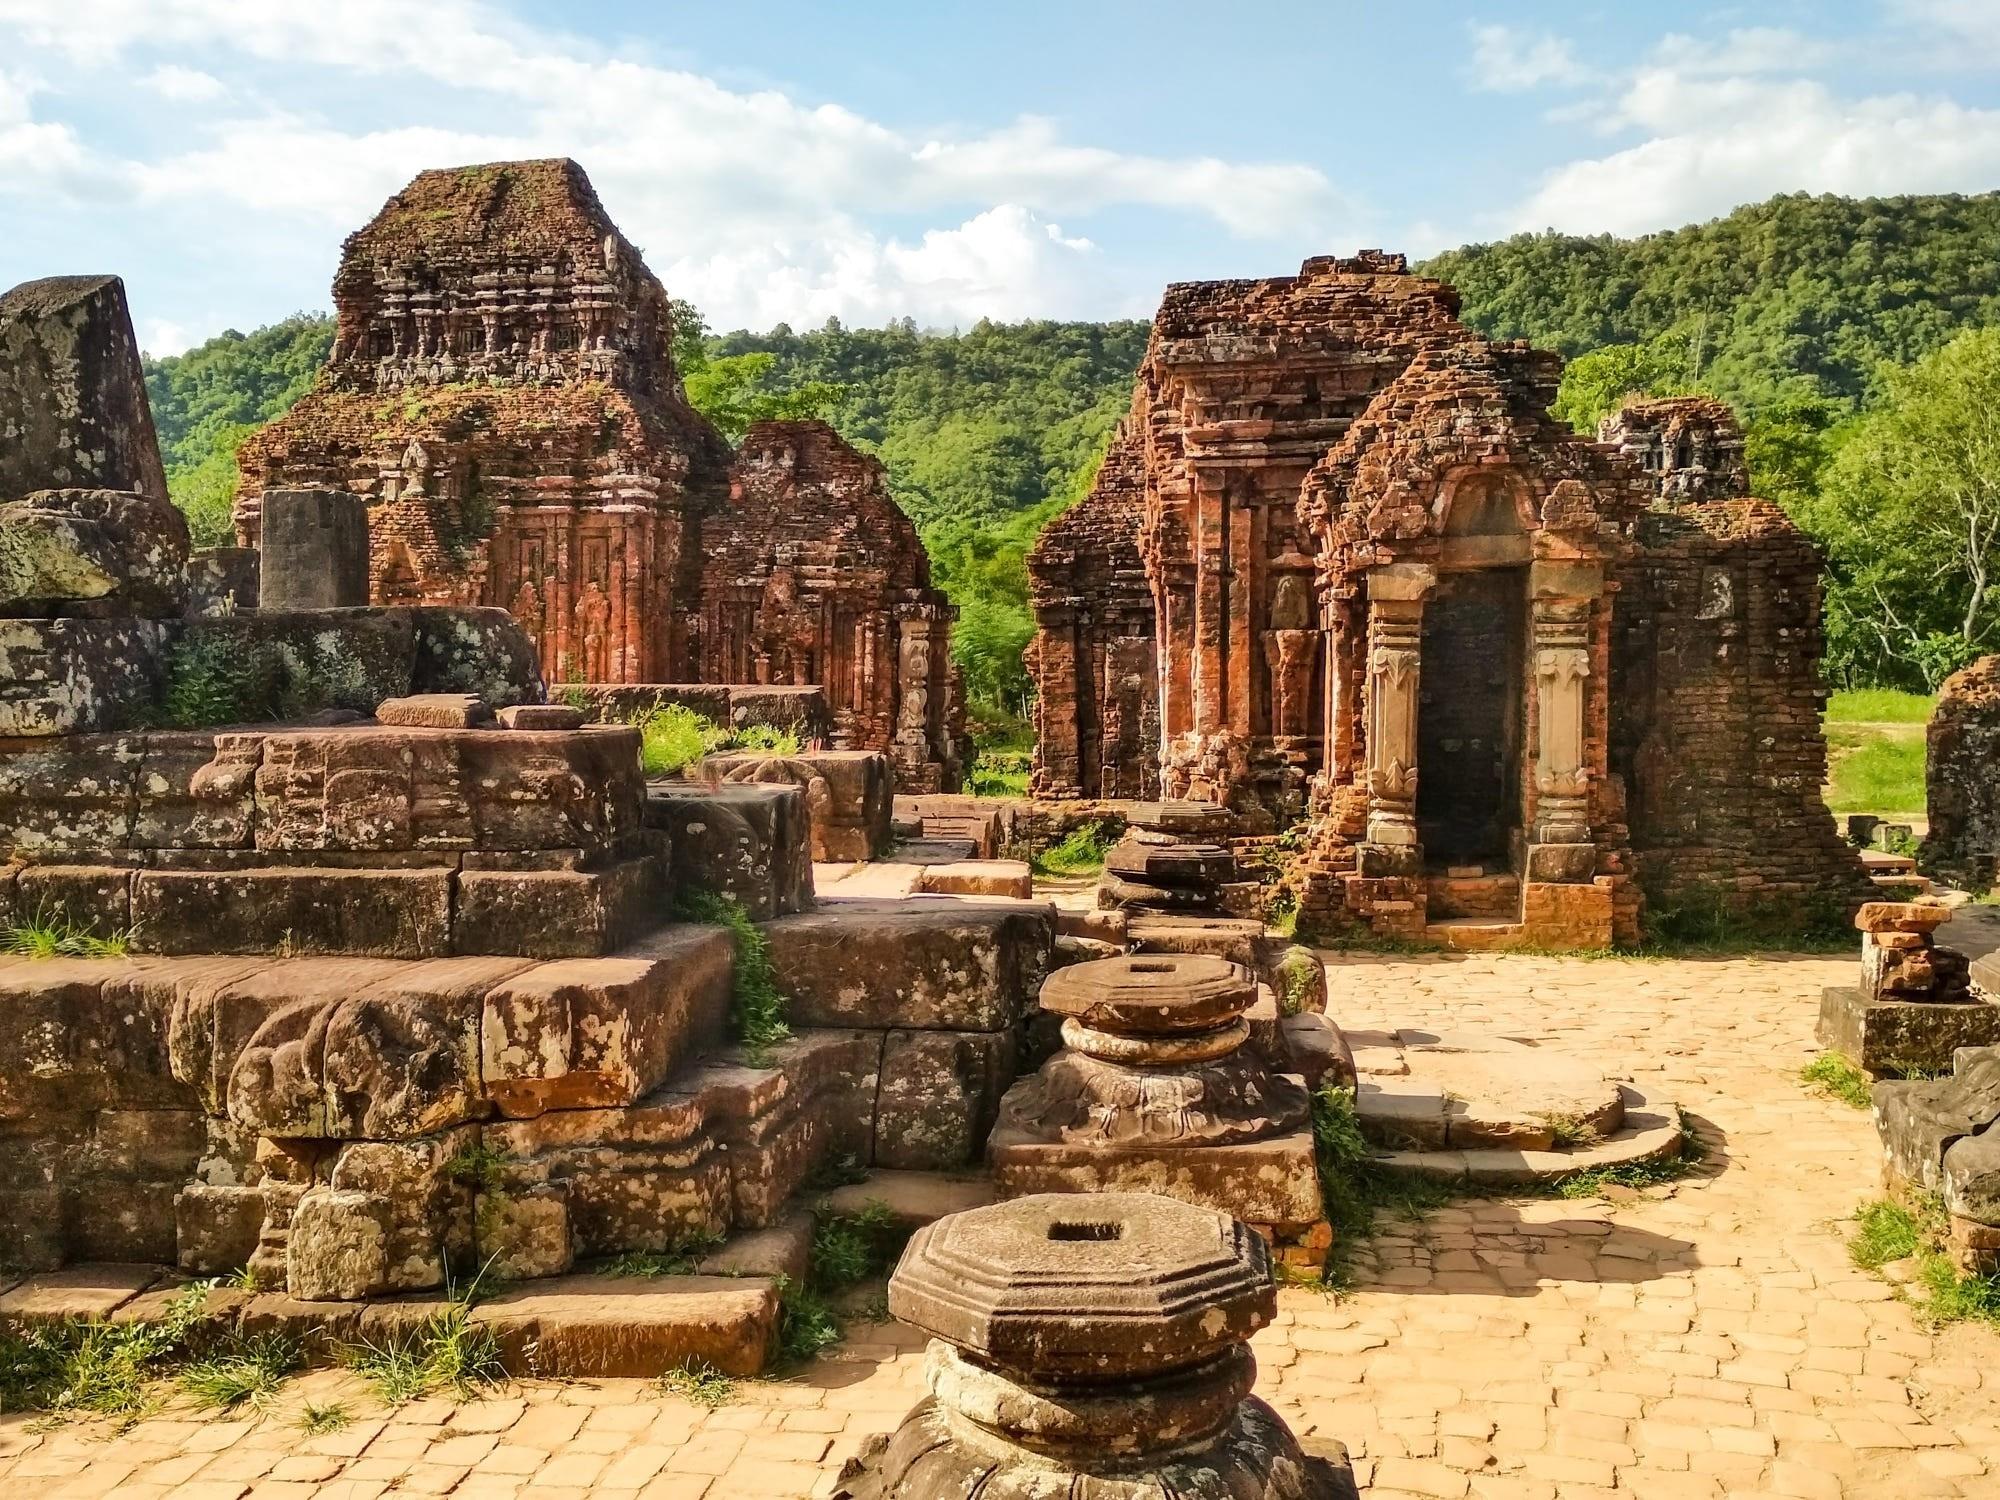 The remains of a stone temple. Photo: Lenka Rakova